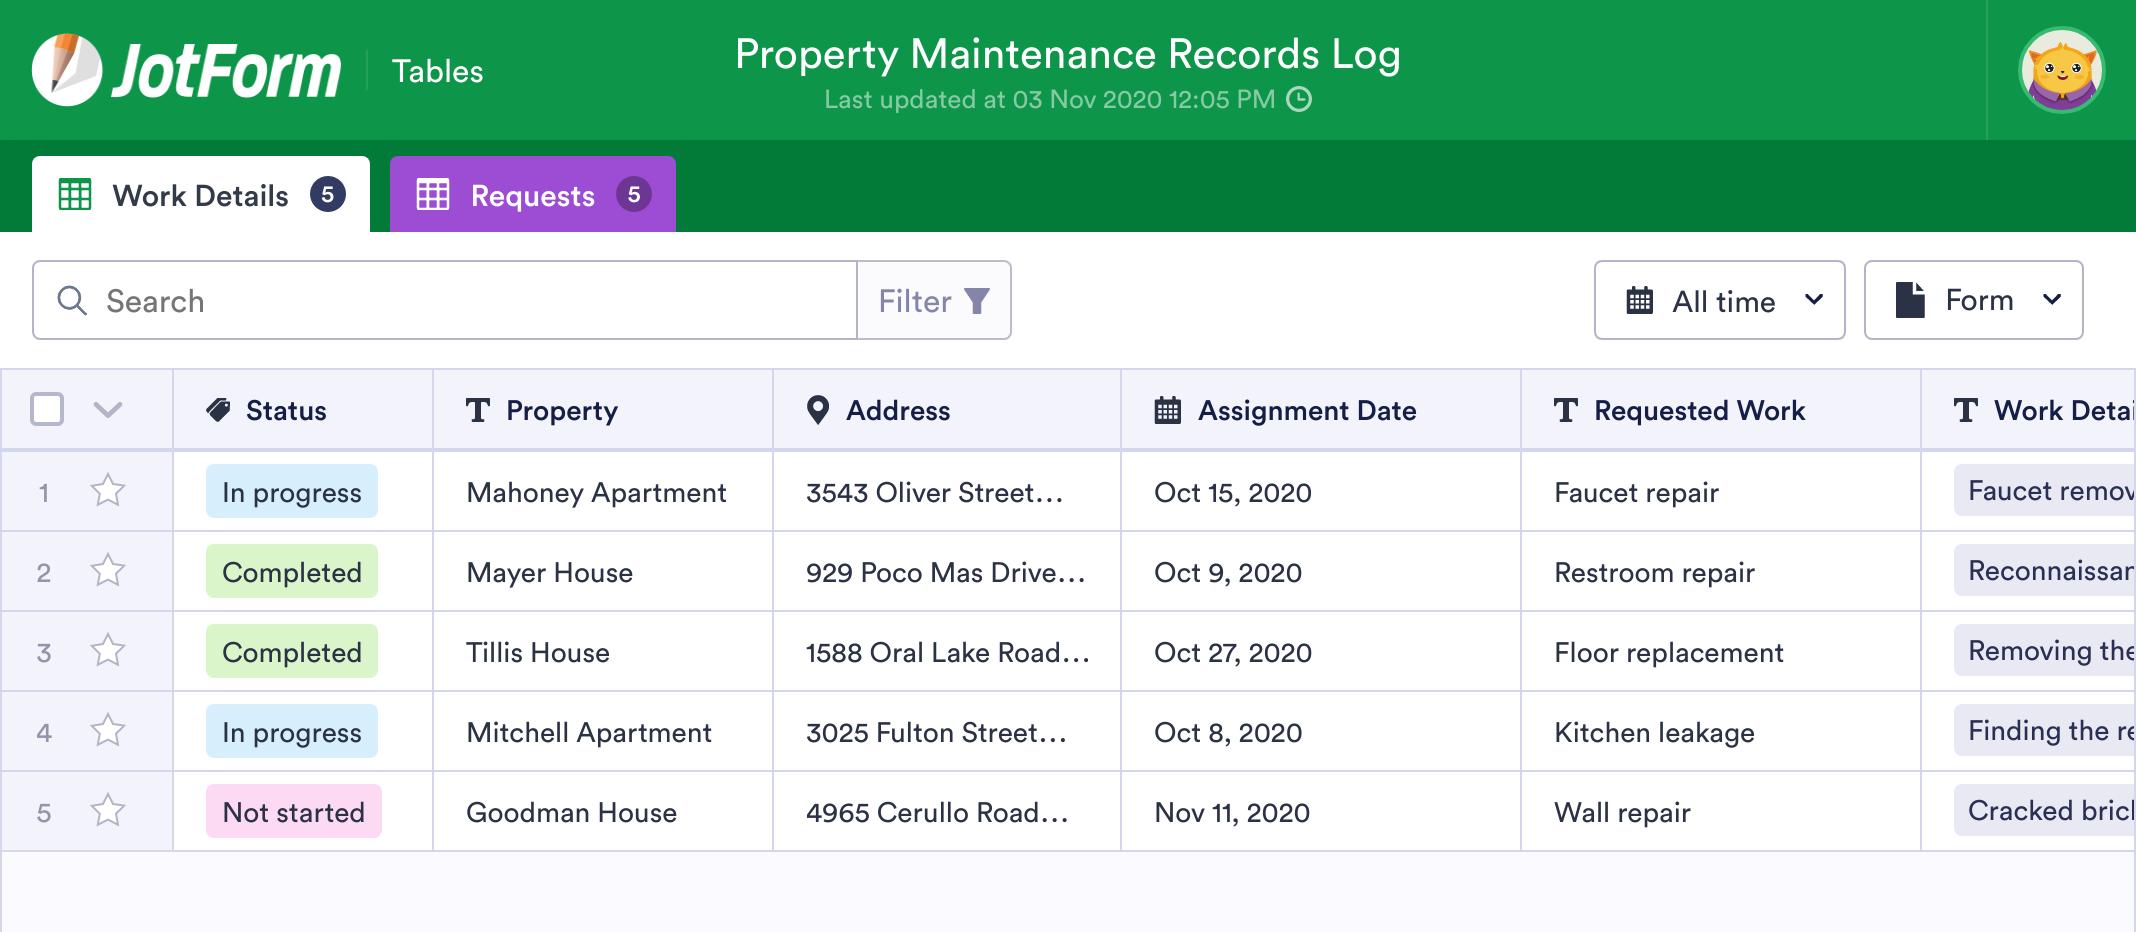 Property Maintenance Records Log